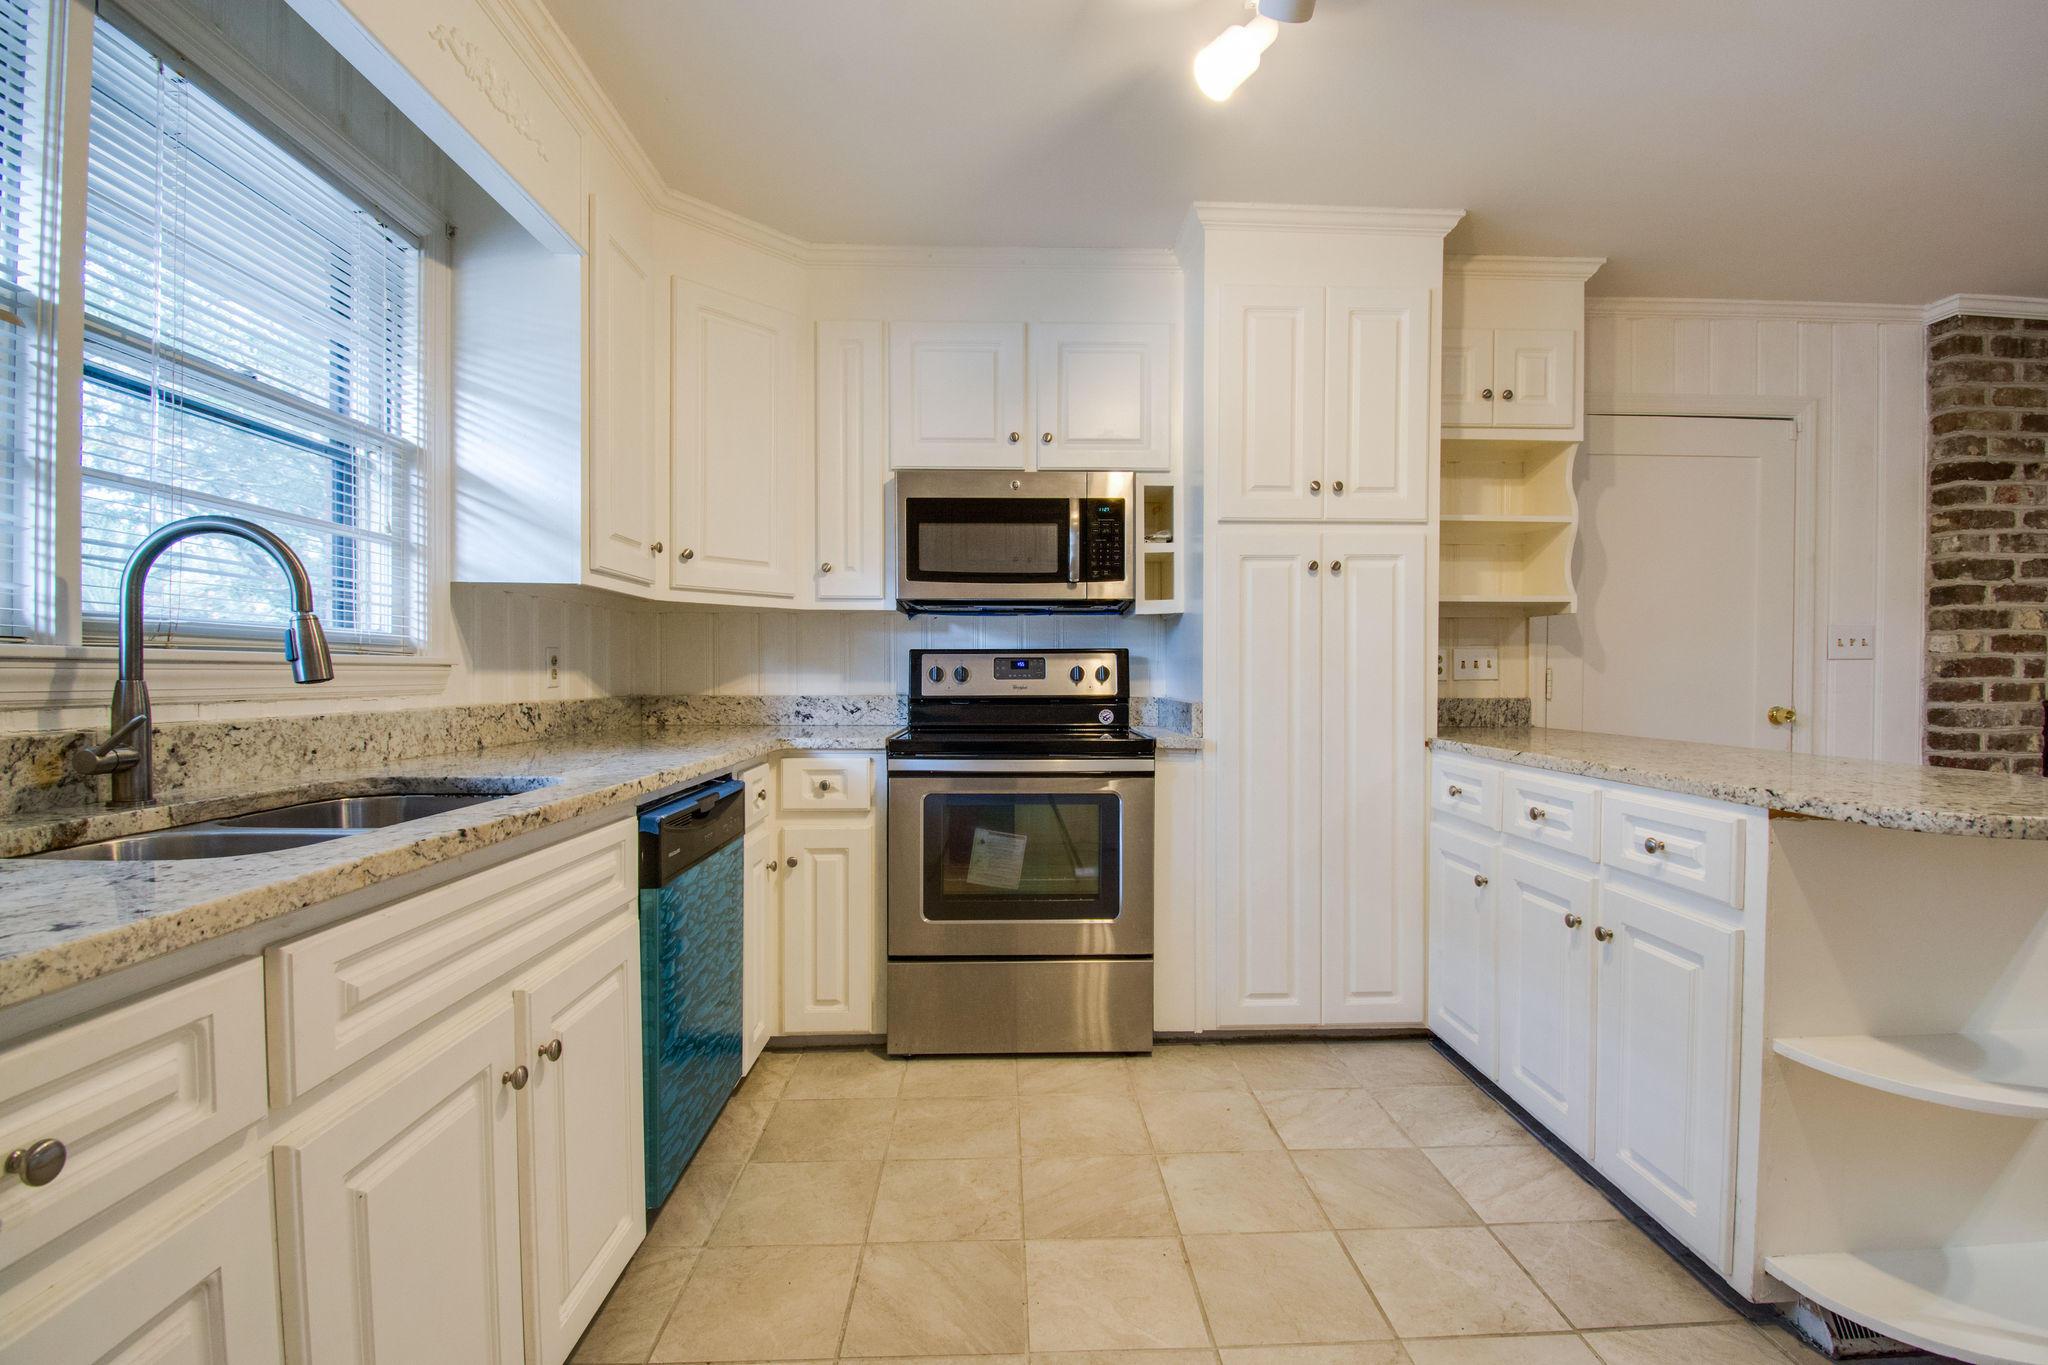 Northbridge Terrace Homes For Sale - 1114 Northbridge, Charleston, SC - 5